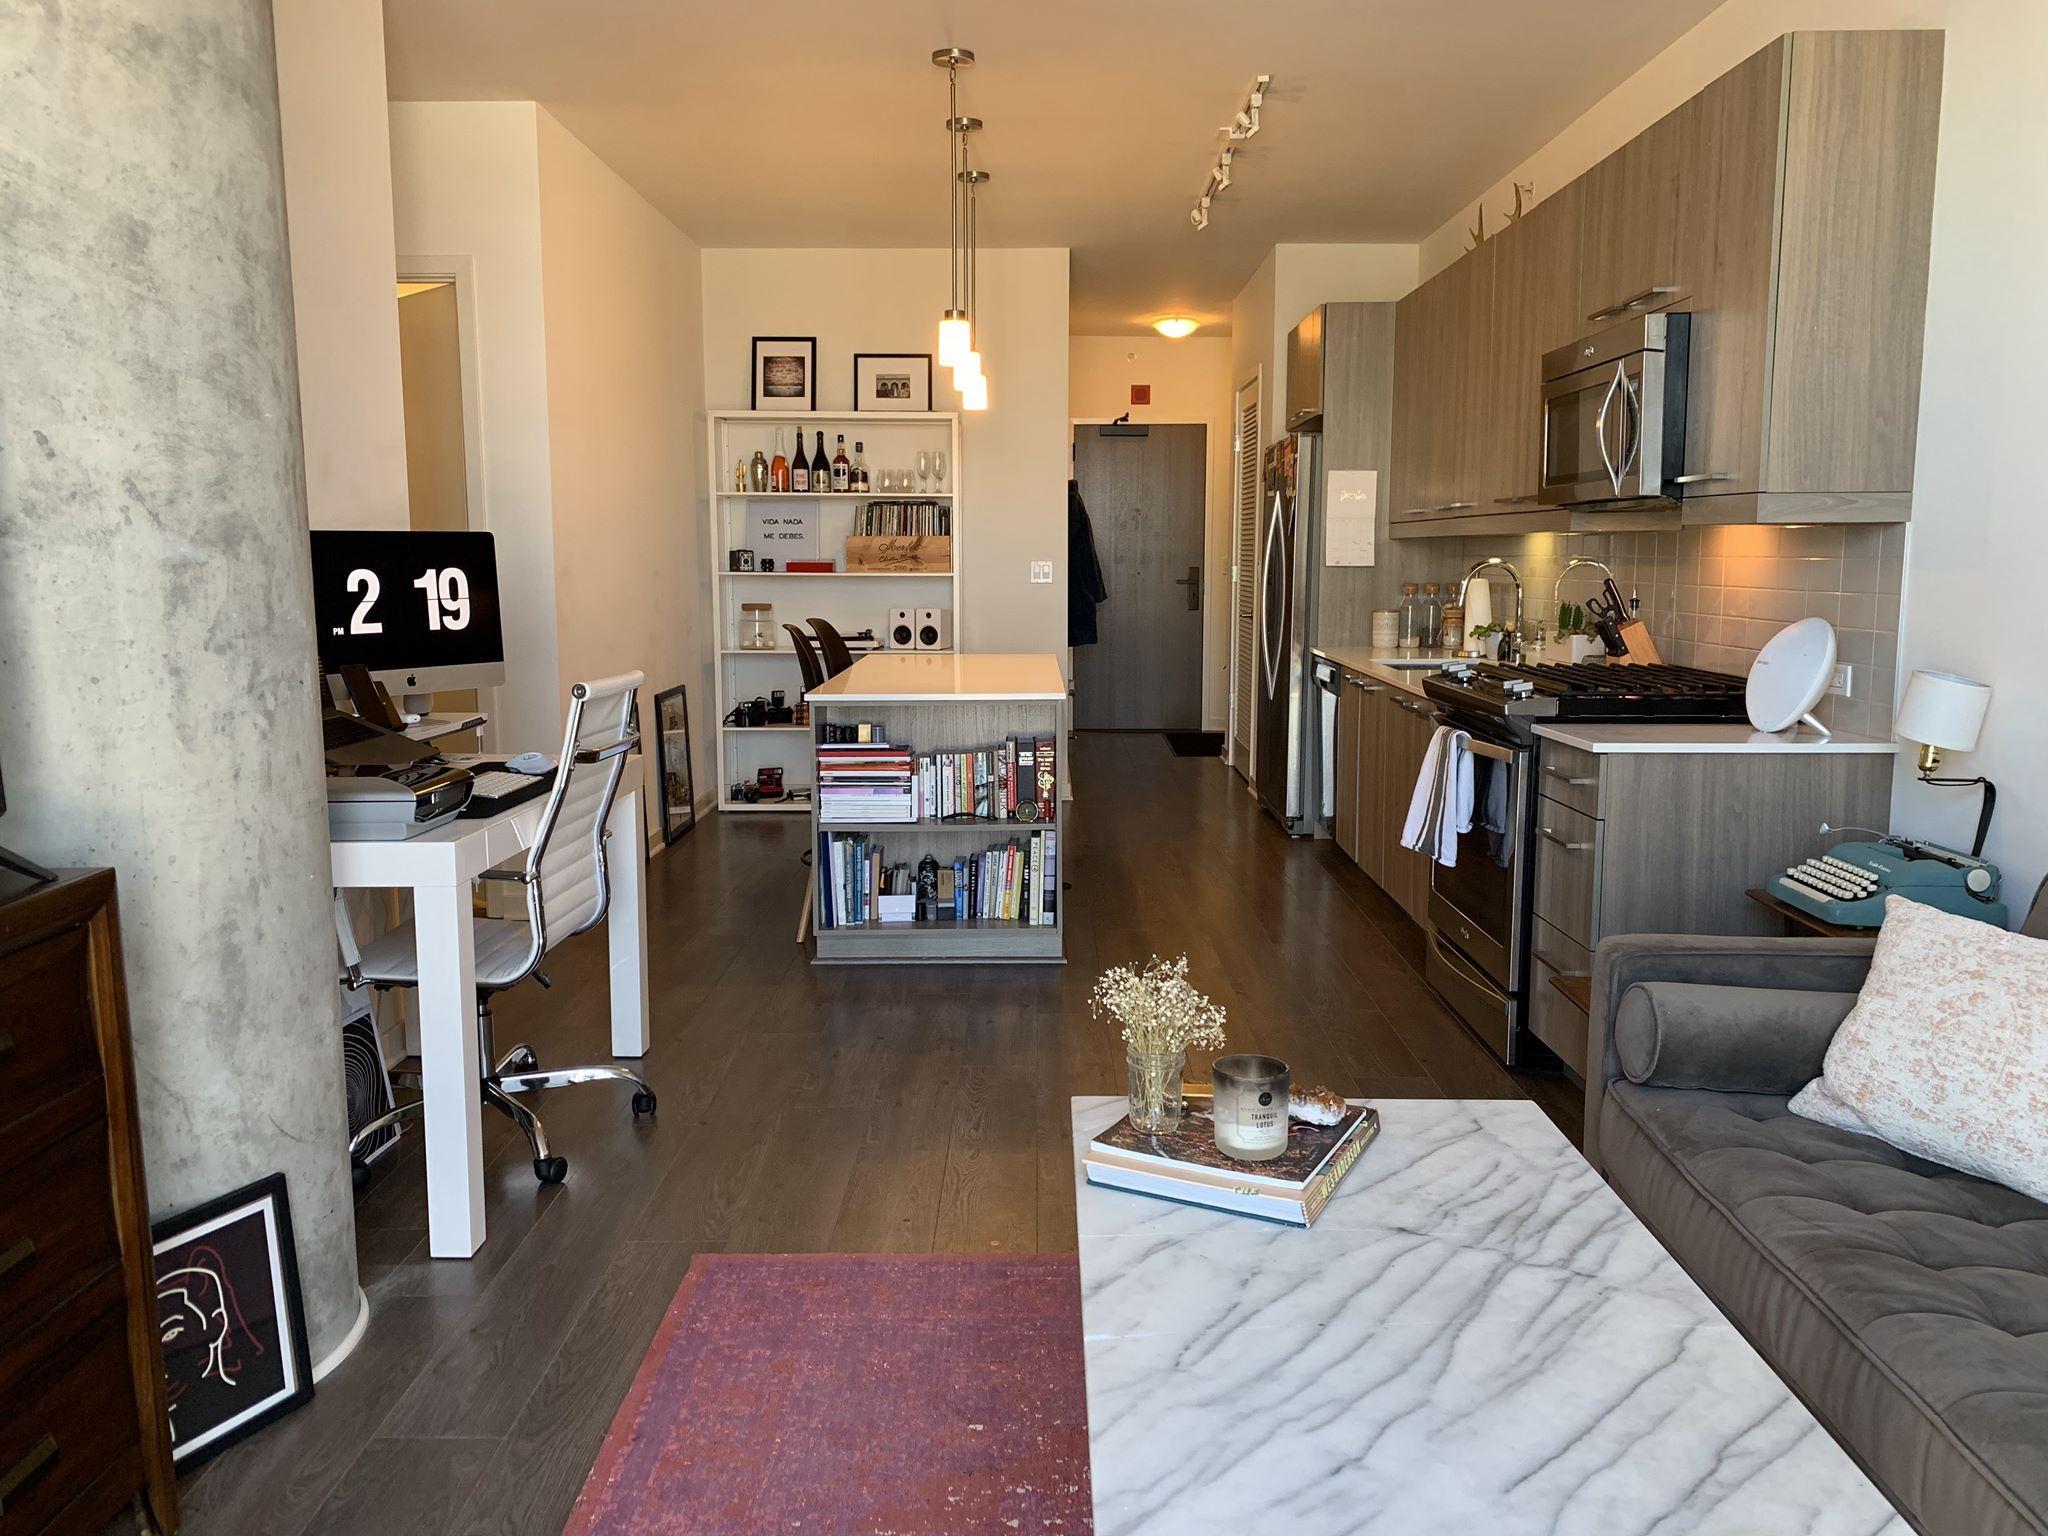 Modern And Contemporary Kitchen And Living Room With Dark Hardwood Floors Pendant Lighting Expose Hardwood Floors Dark Lofts For Rent White Quartz Countertop